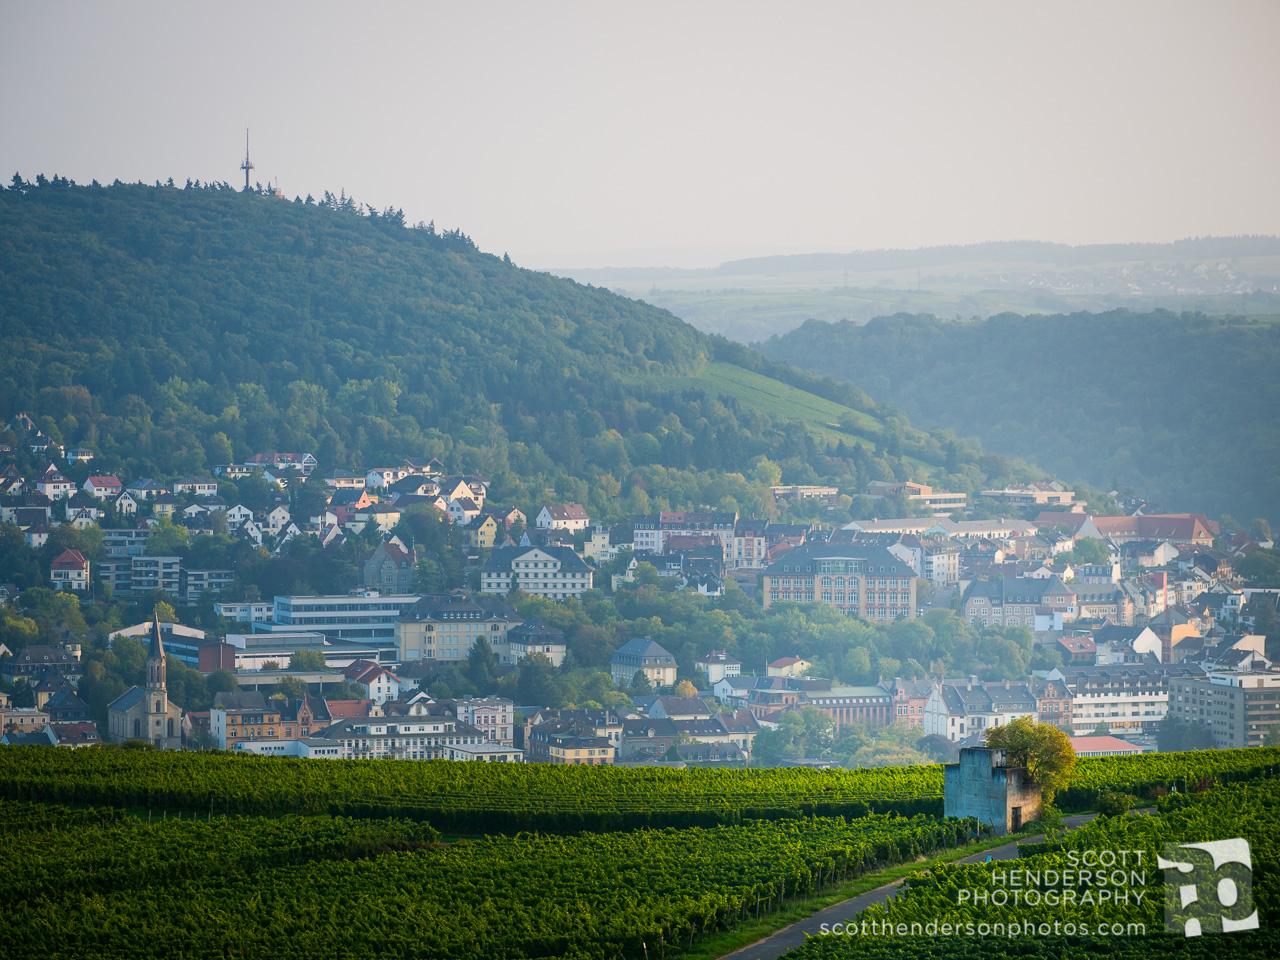 shp-germany-2014-021-blog.jpg